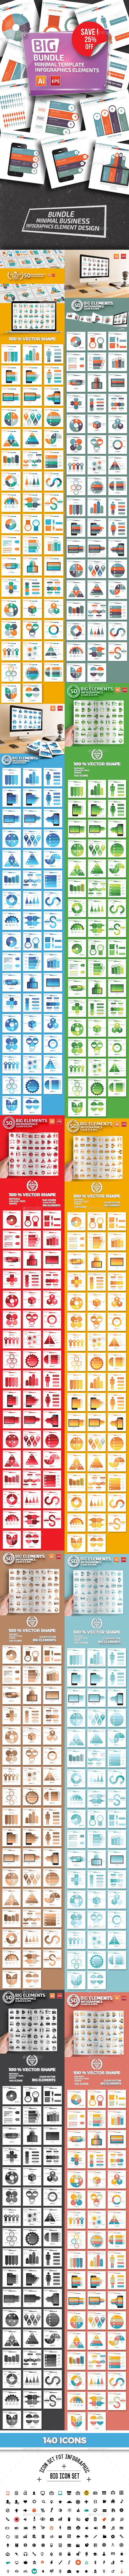 GraphicRiver Bundle 500 Minimal Infographics Design 20508971